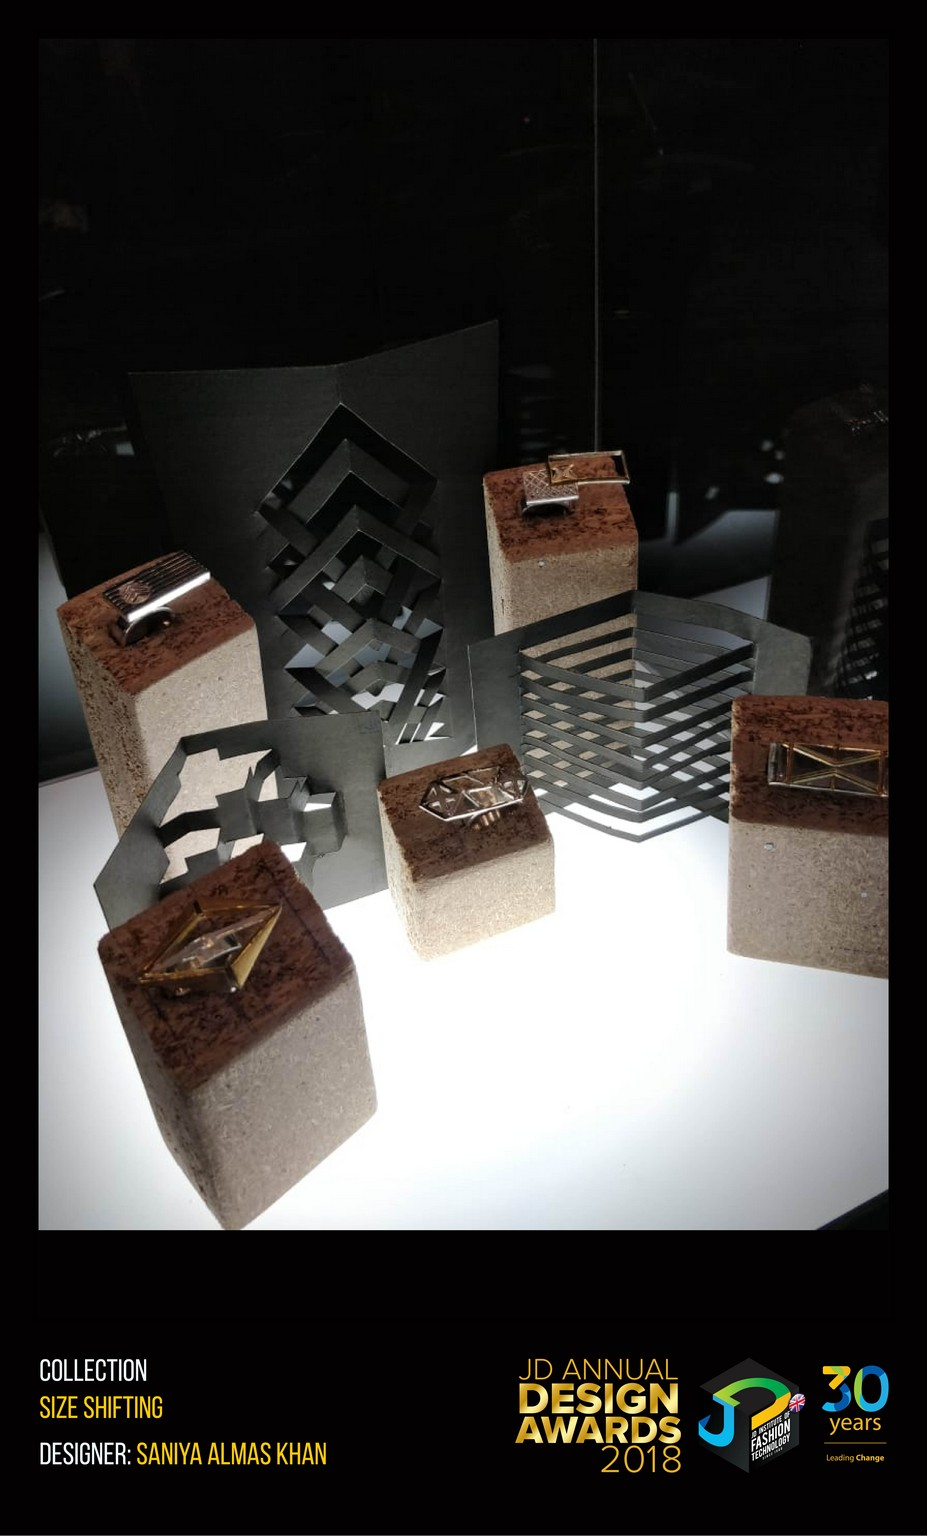 Size Shifting – Change – JD Annual Design Awards 2018 | Designer: Saniya Almas Khan | Photography : Jerin Nath (@jerin_nath) size shifting - Size Shifting - Size Shifting – Change – JD Annual Design Awards 2018